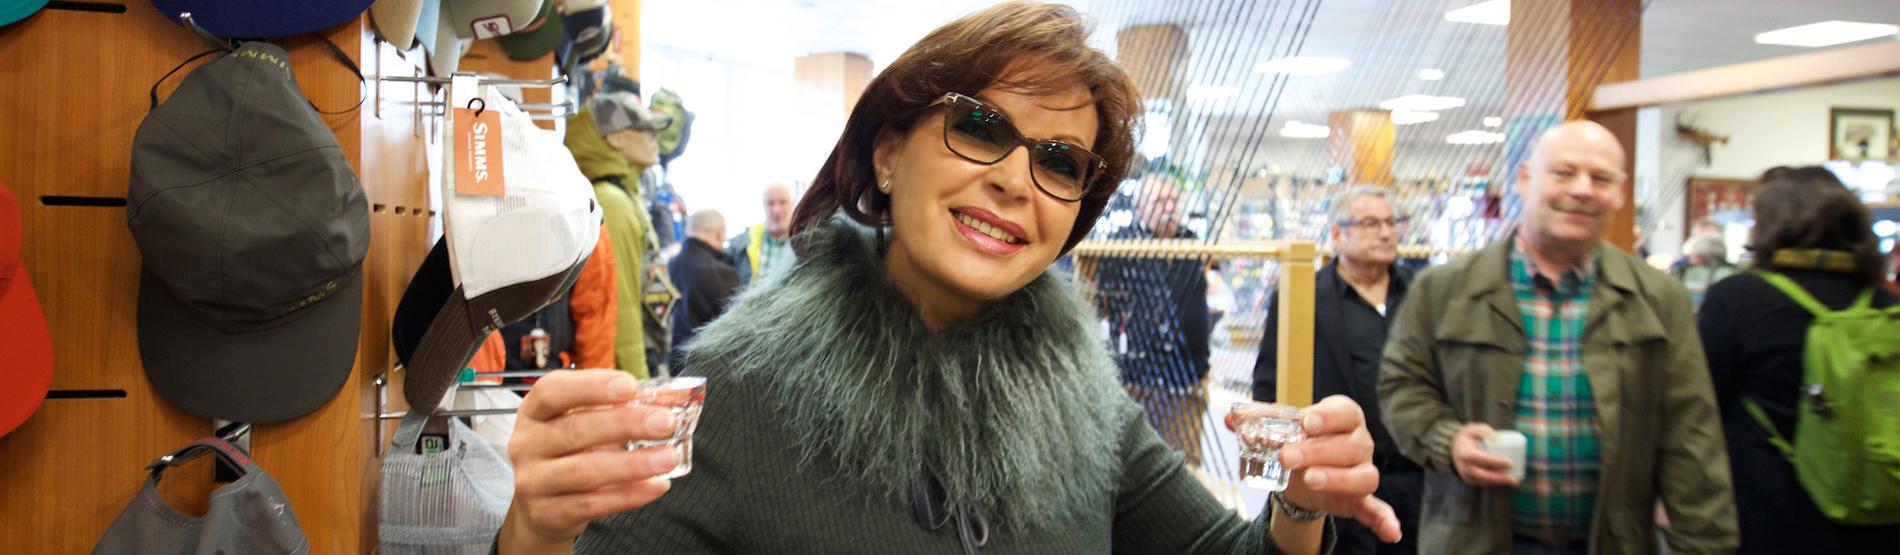 Mirjana Pavlic auf Hausmesse von Flyfishing Europe